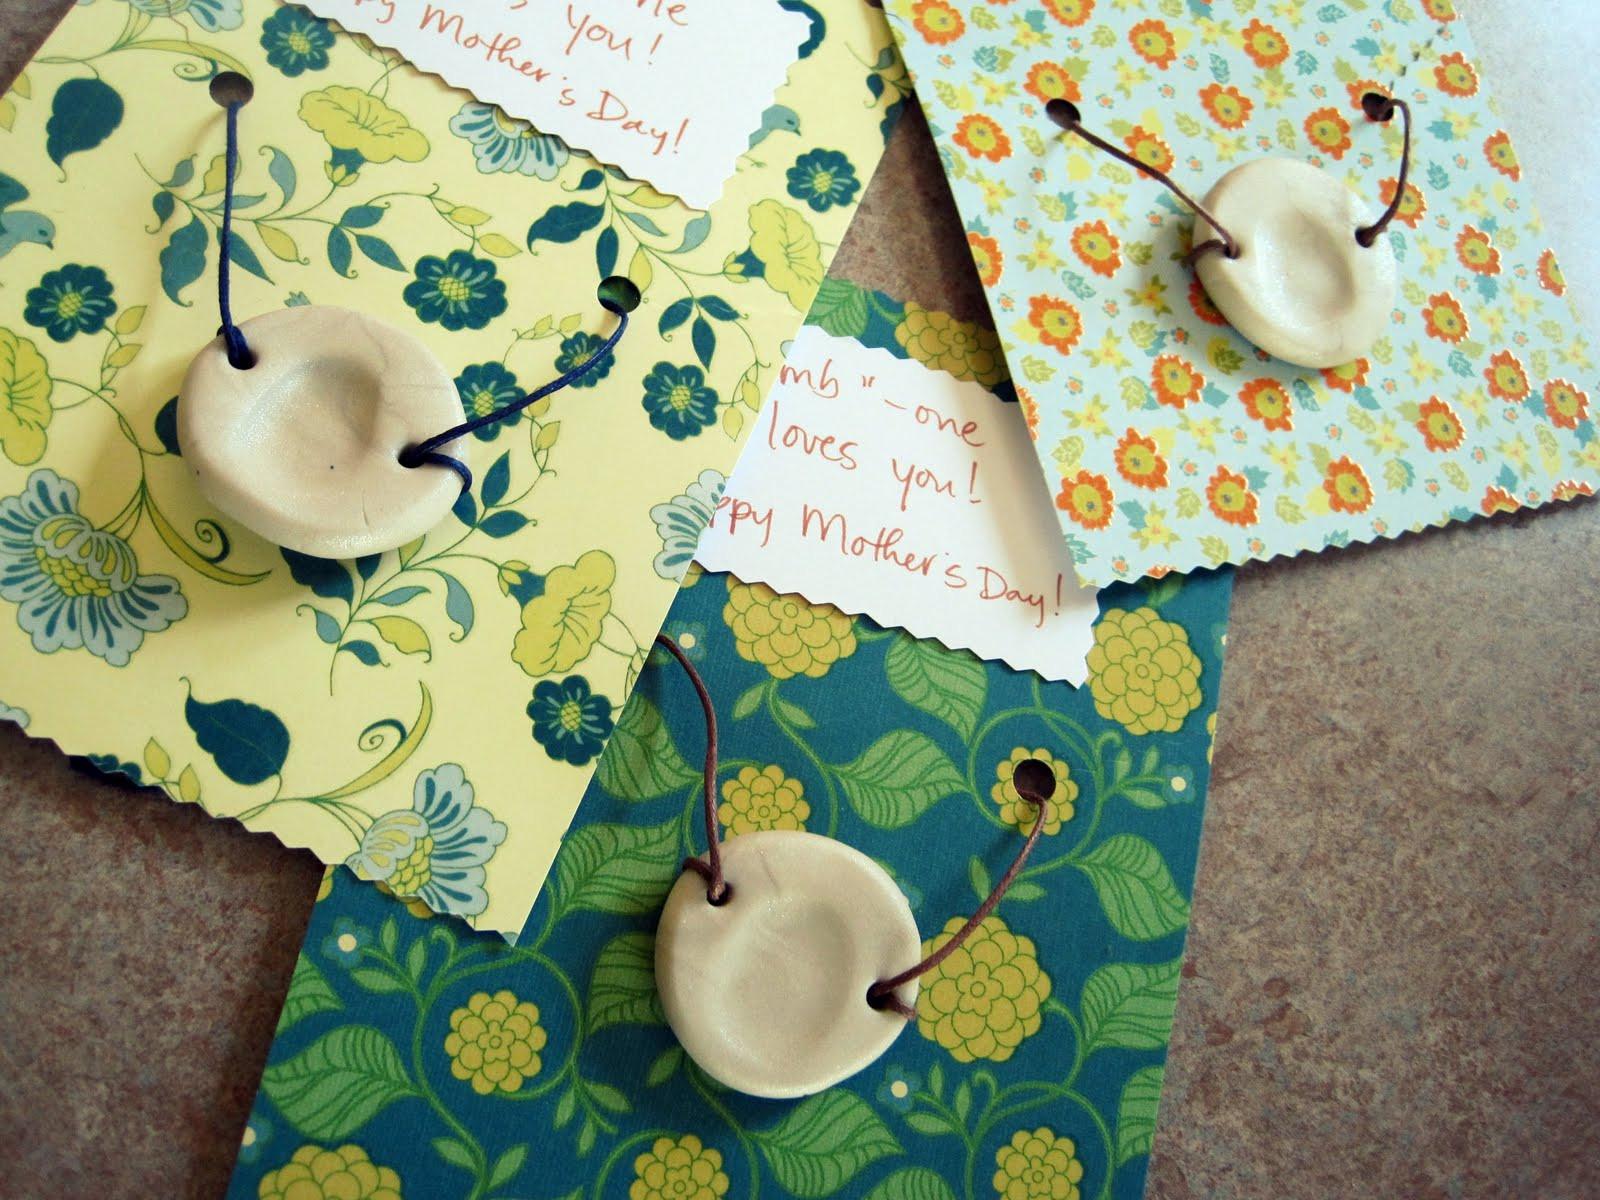 Preschool Mothers Day Gift Ideas  Katie s Secret Blog Mother s Day t ideas